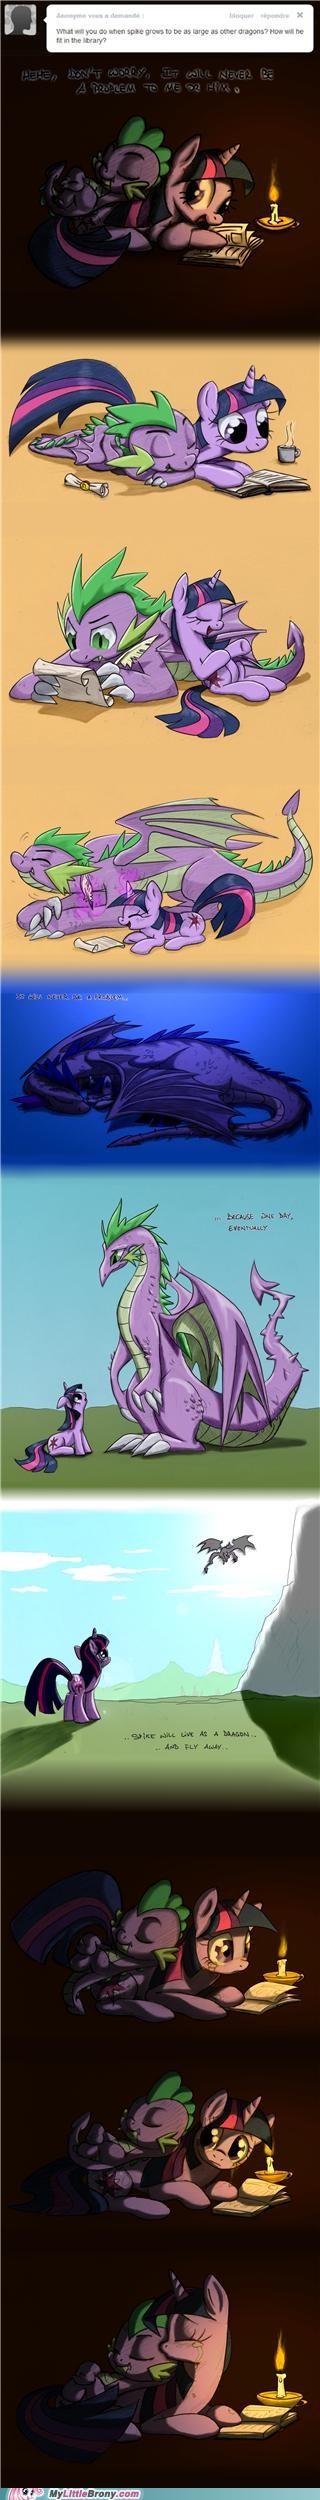 best of week brony tears comics dragon spike twilight sparkle - 5269047040